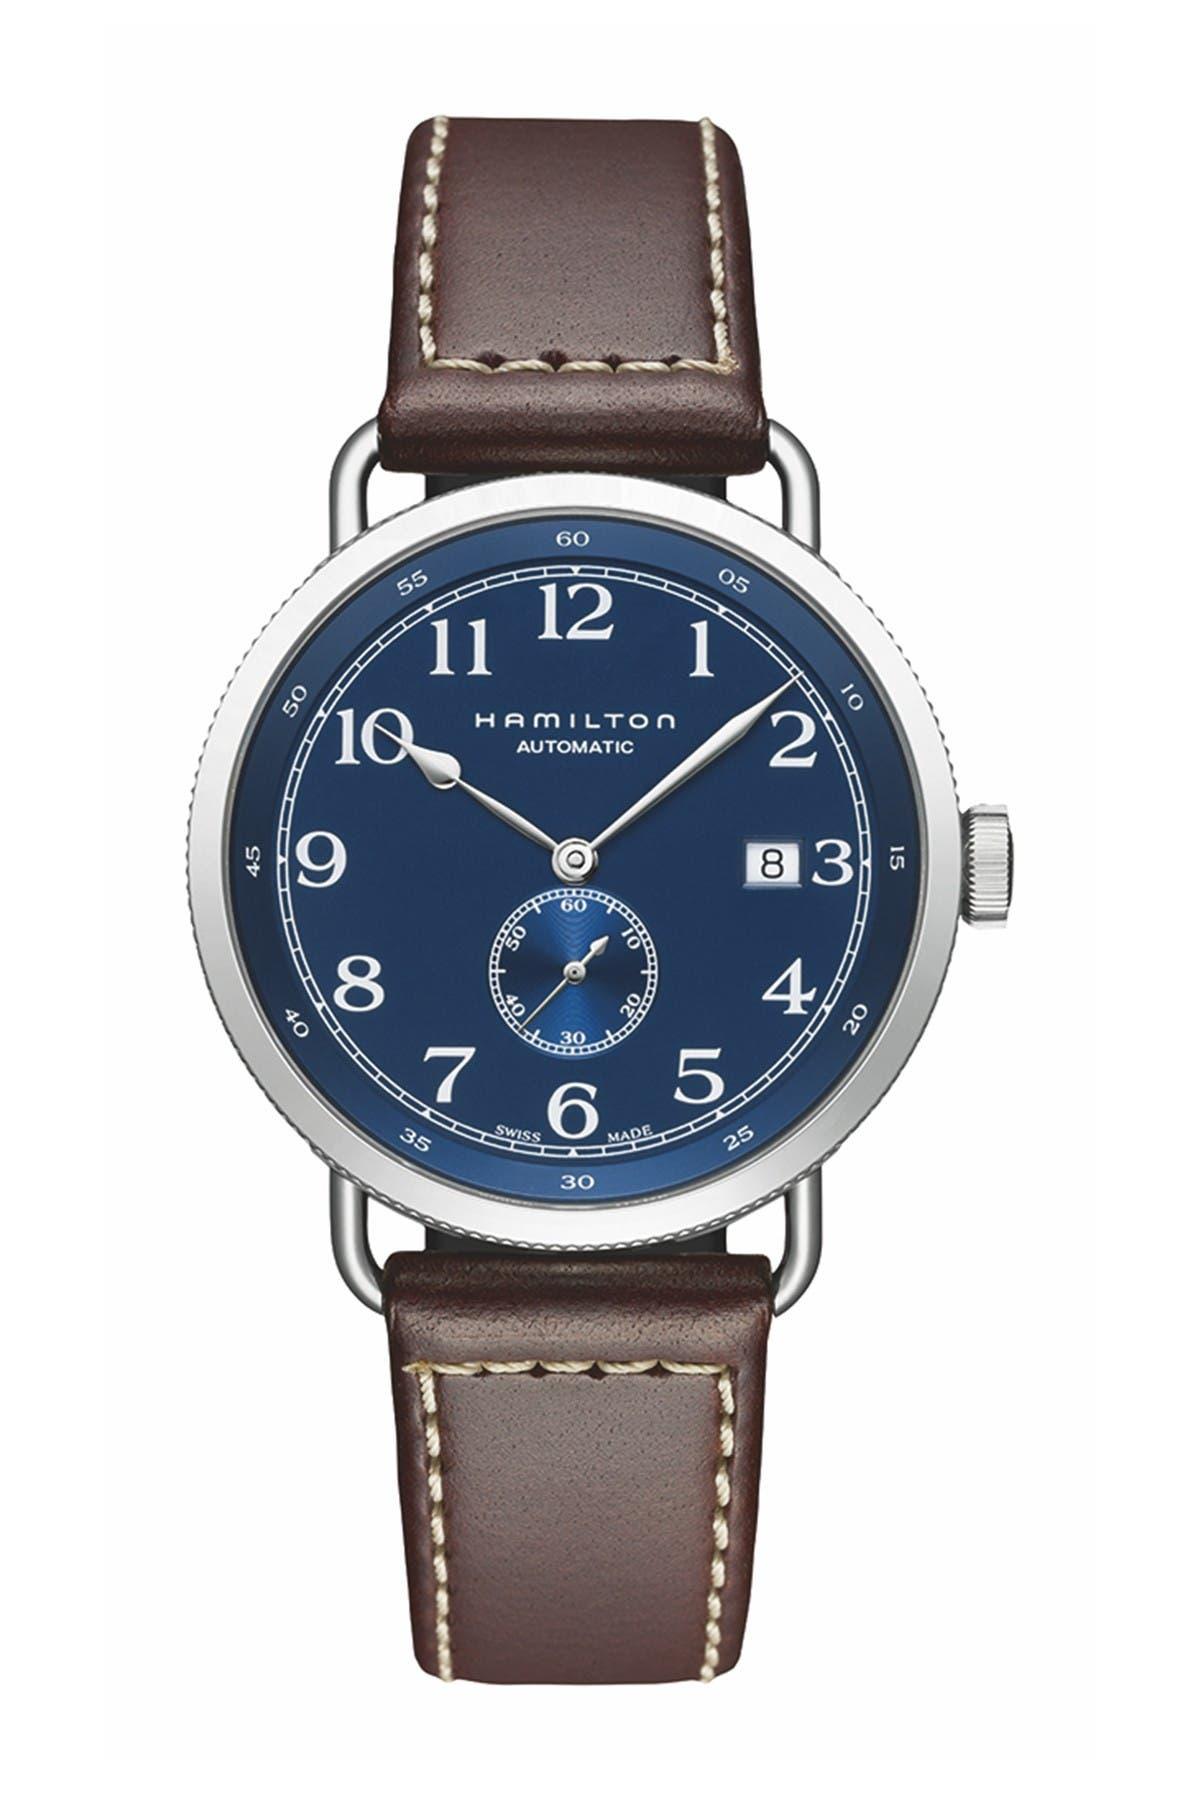 Image of Hamilton Men's Khaki Navy Swiss Automatic Watch, 40mm